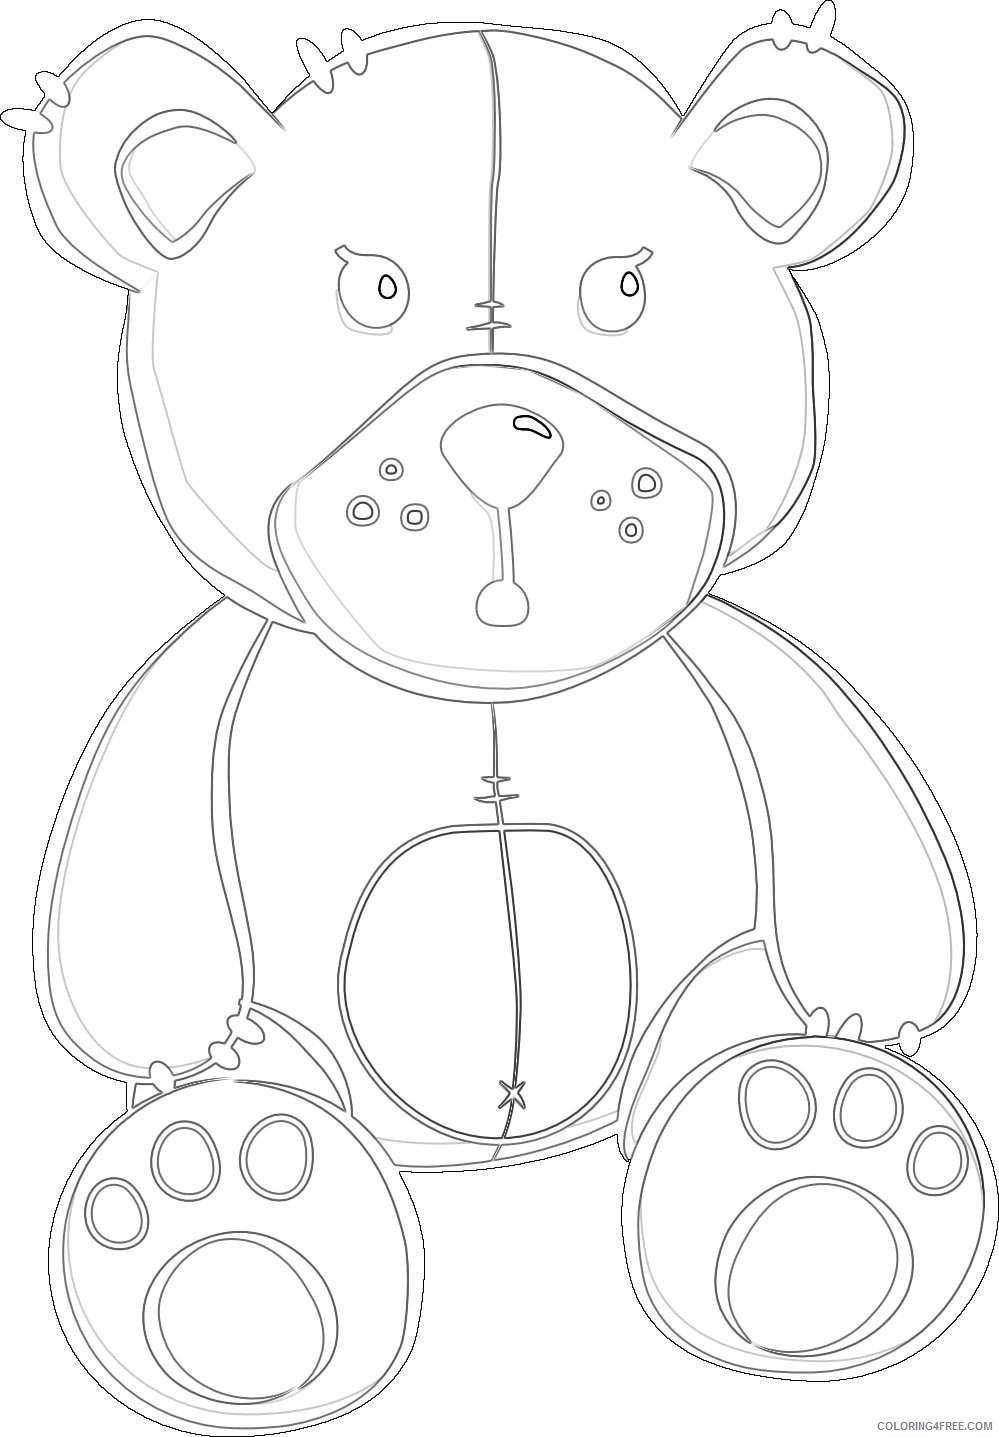 teddy bear 3 coloring_002